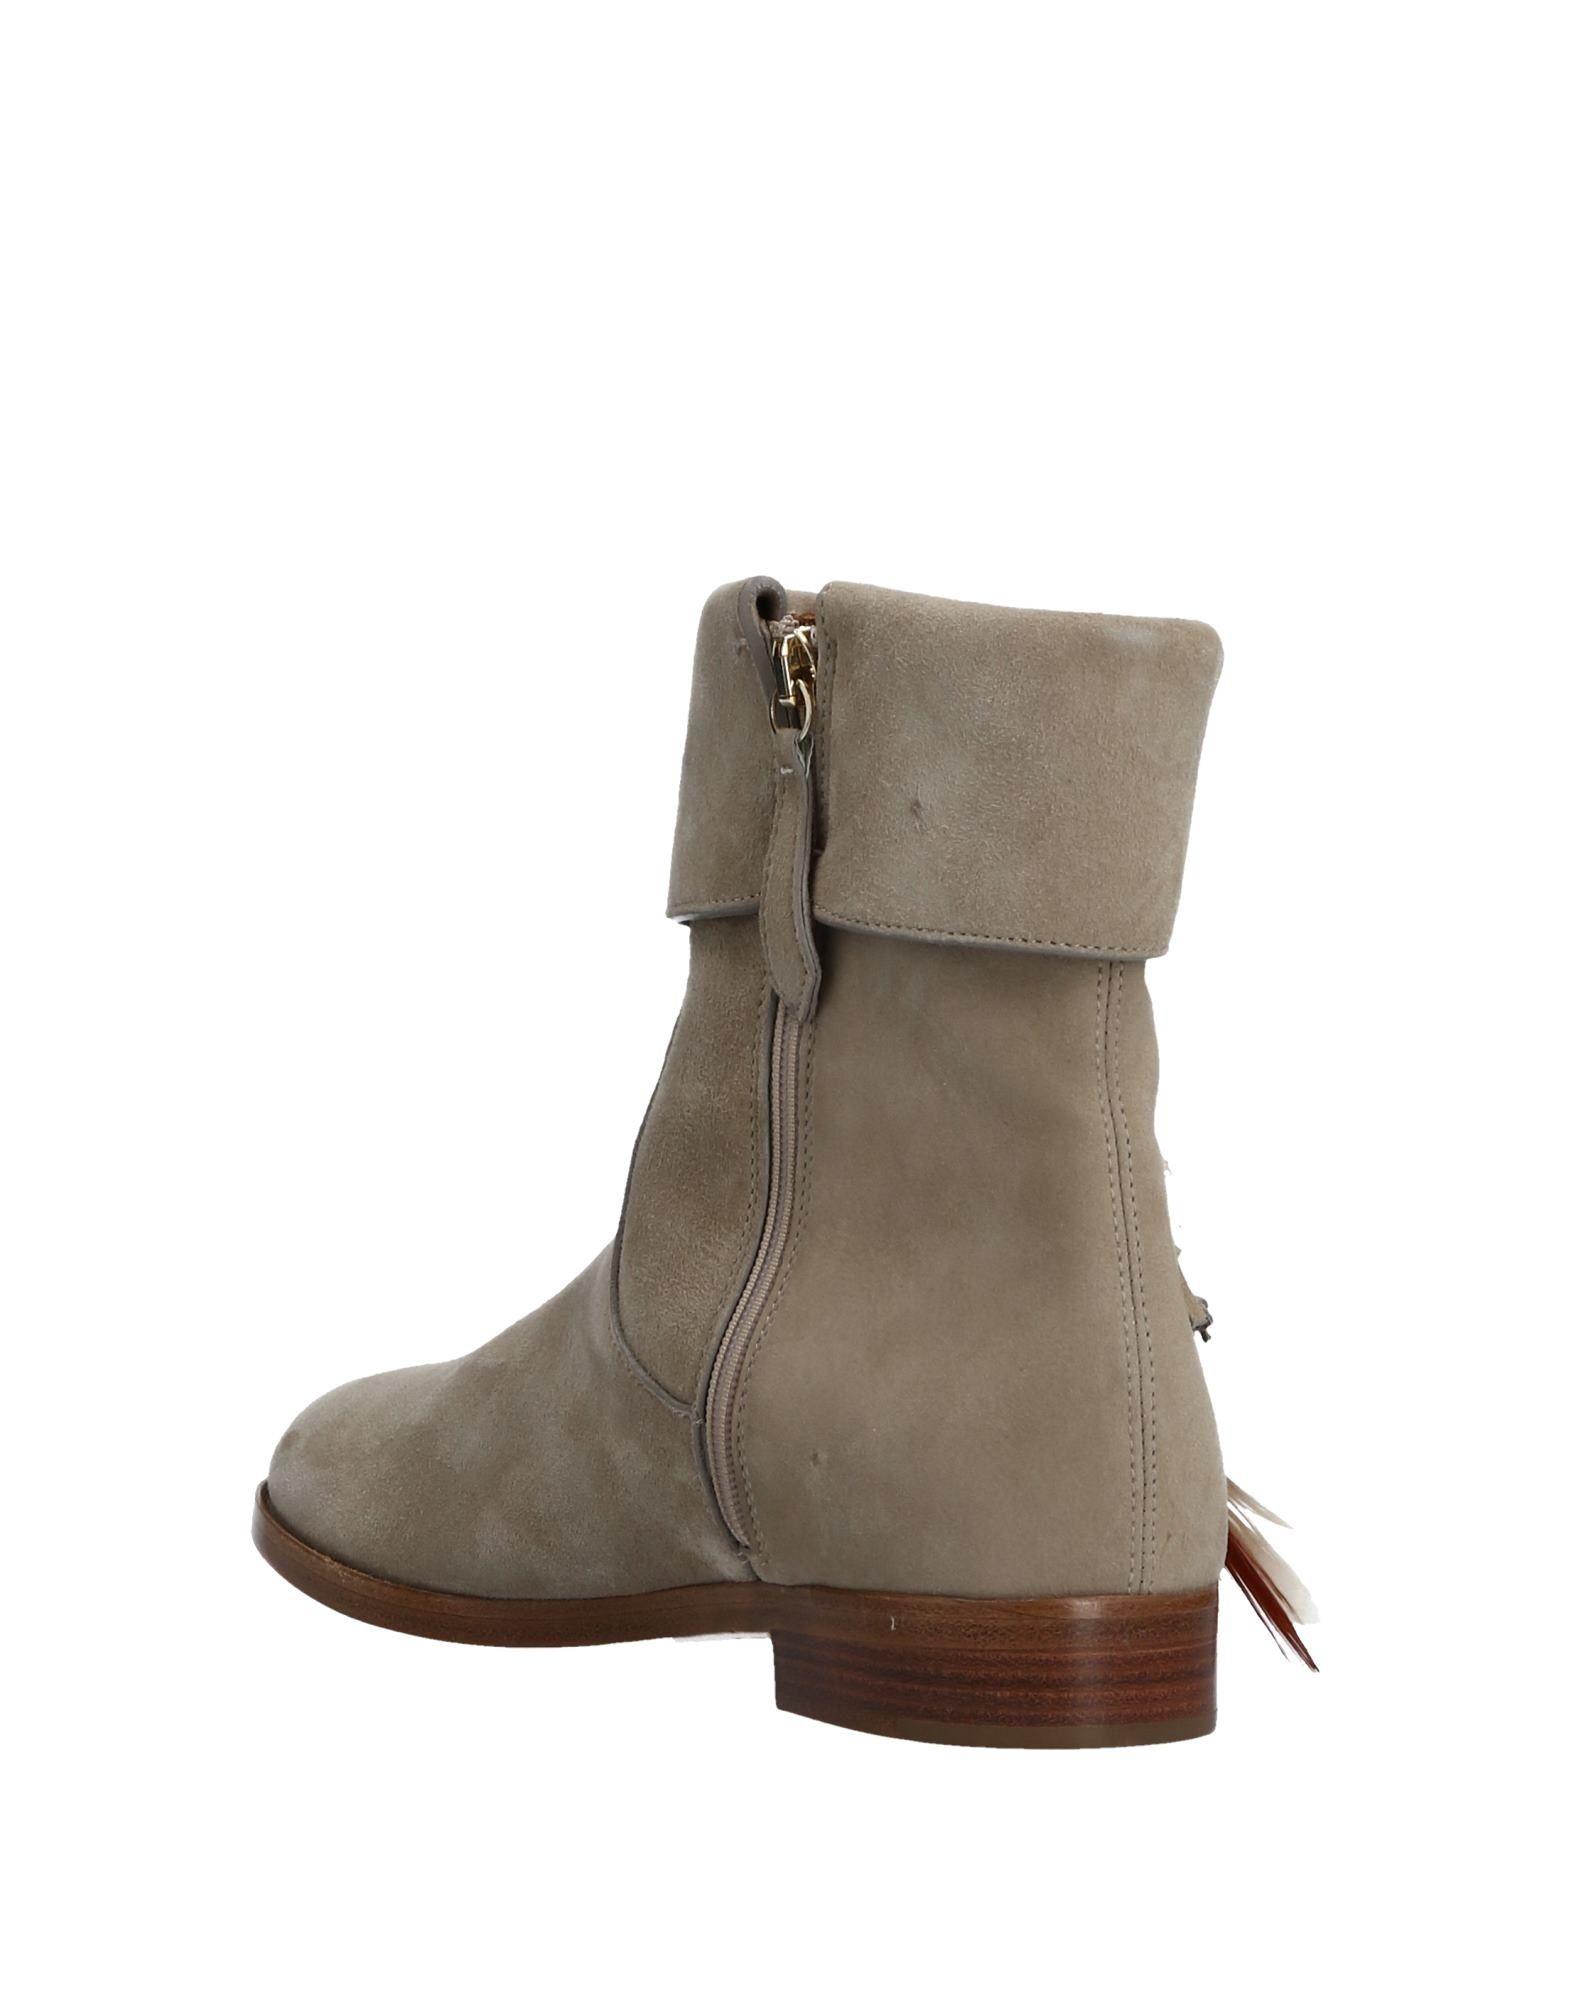 Aquazzura Stiefelette aussehende Damen  11025087XGGünstige gut aussehende Stiefelette Schuhe ff1aa0